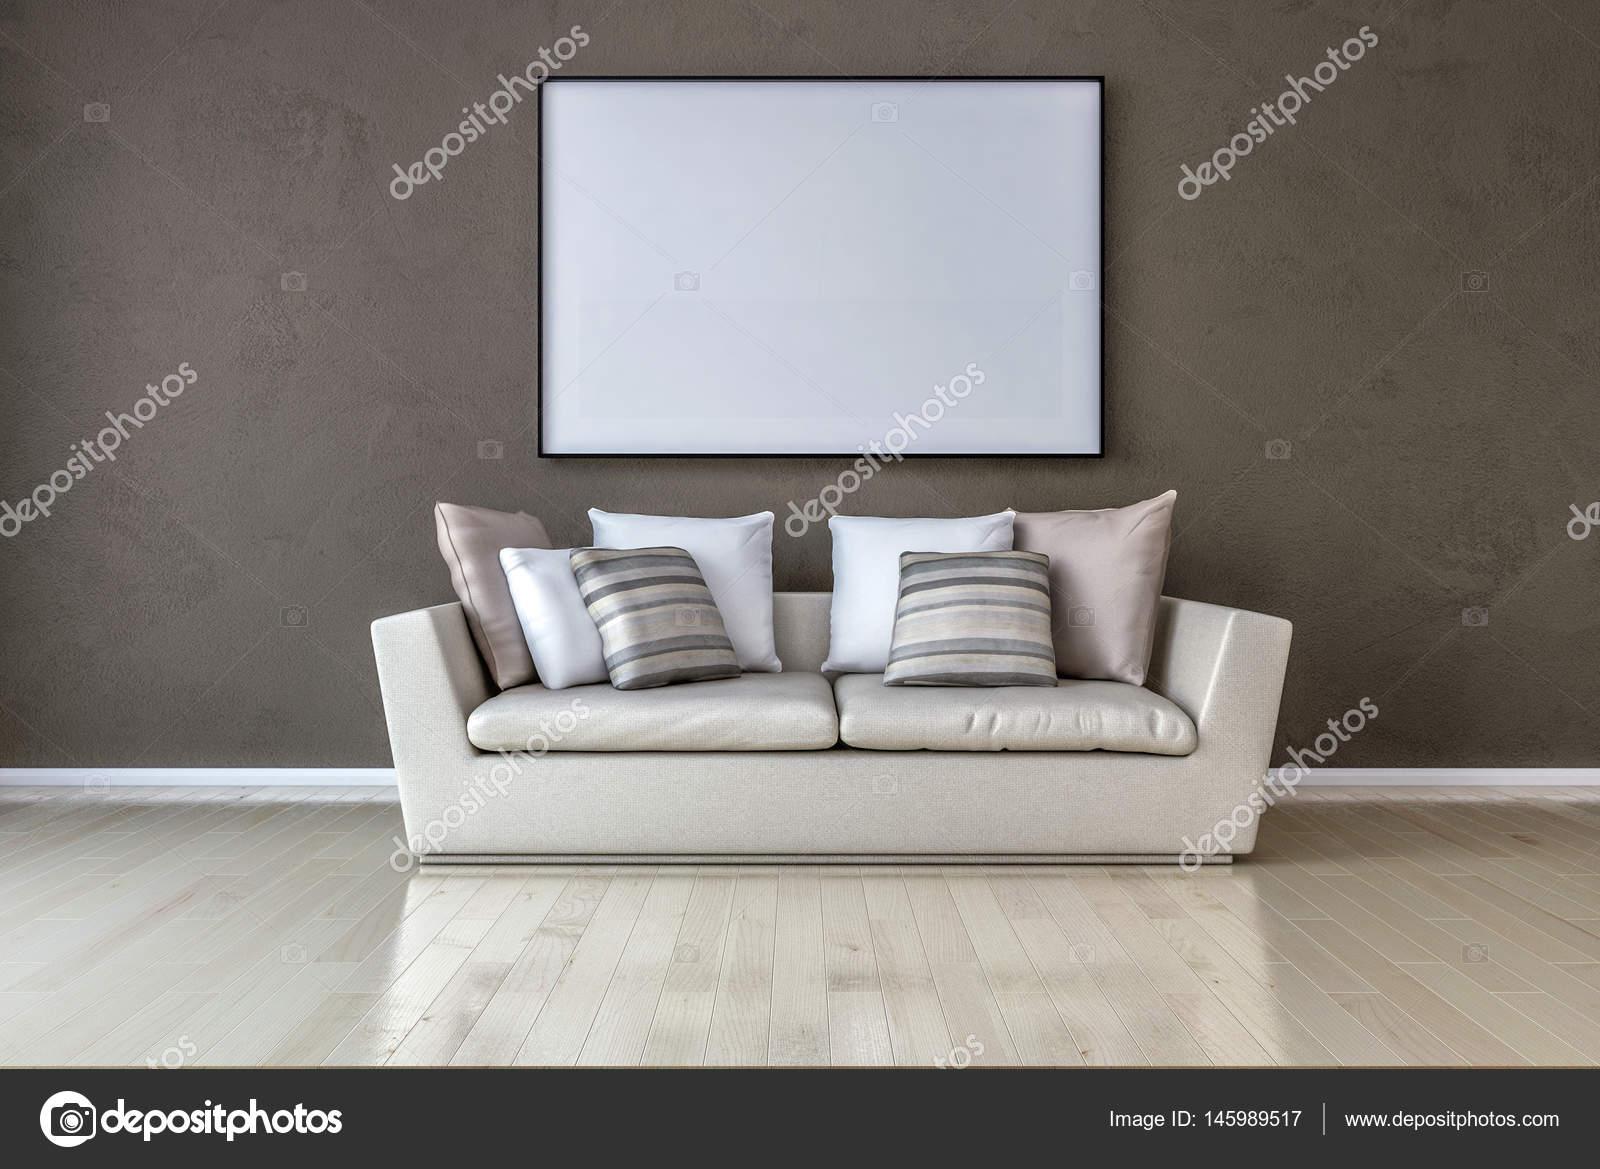 Pareti In Tela : Tela stanza parete verde interno bianco galleria vuoto